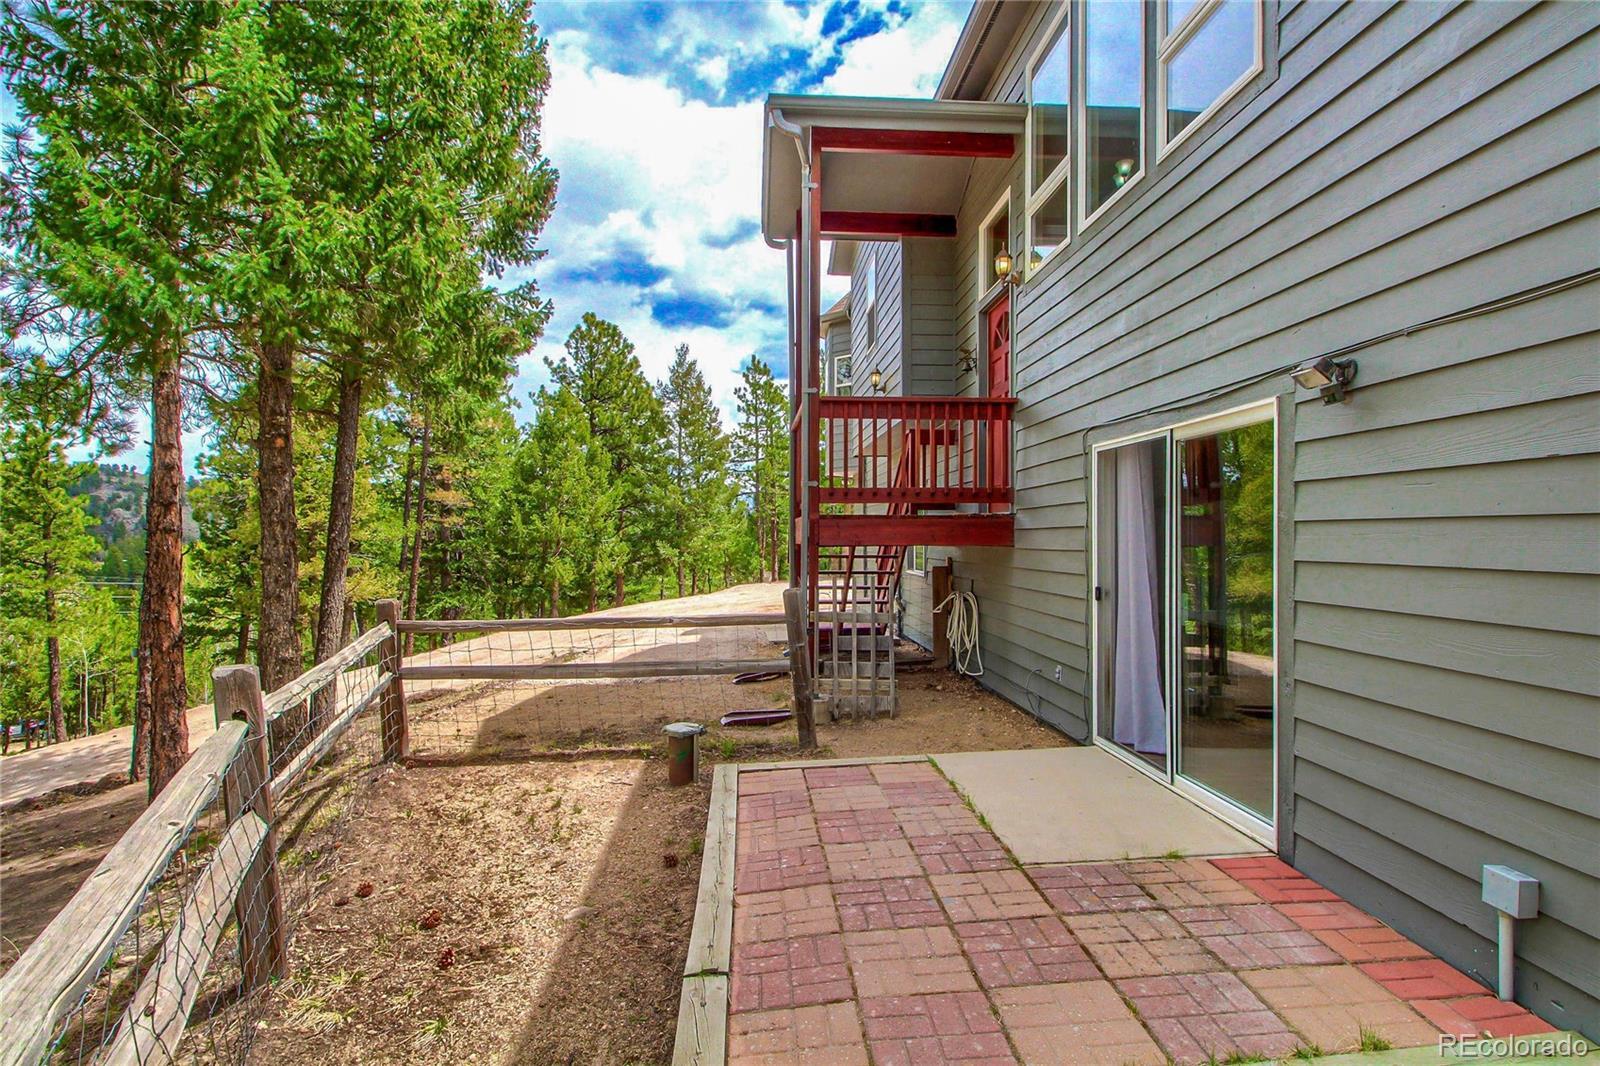 MLS# 7085048 - 2 - 15394 S Wandcrest Drive, Pine, CO 80470